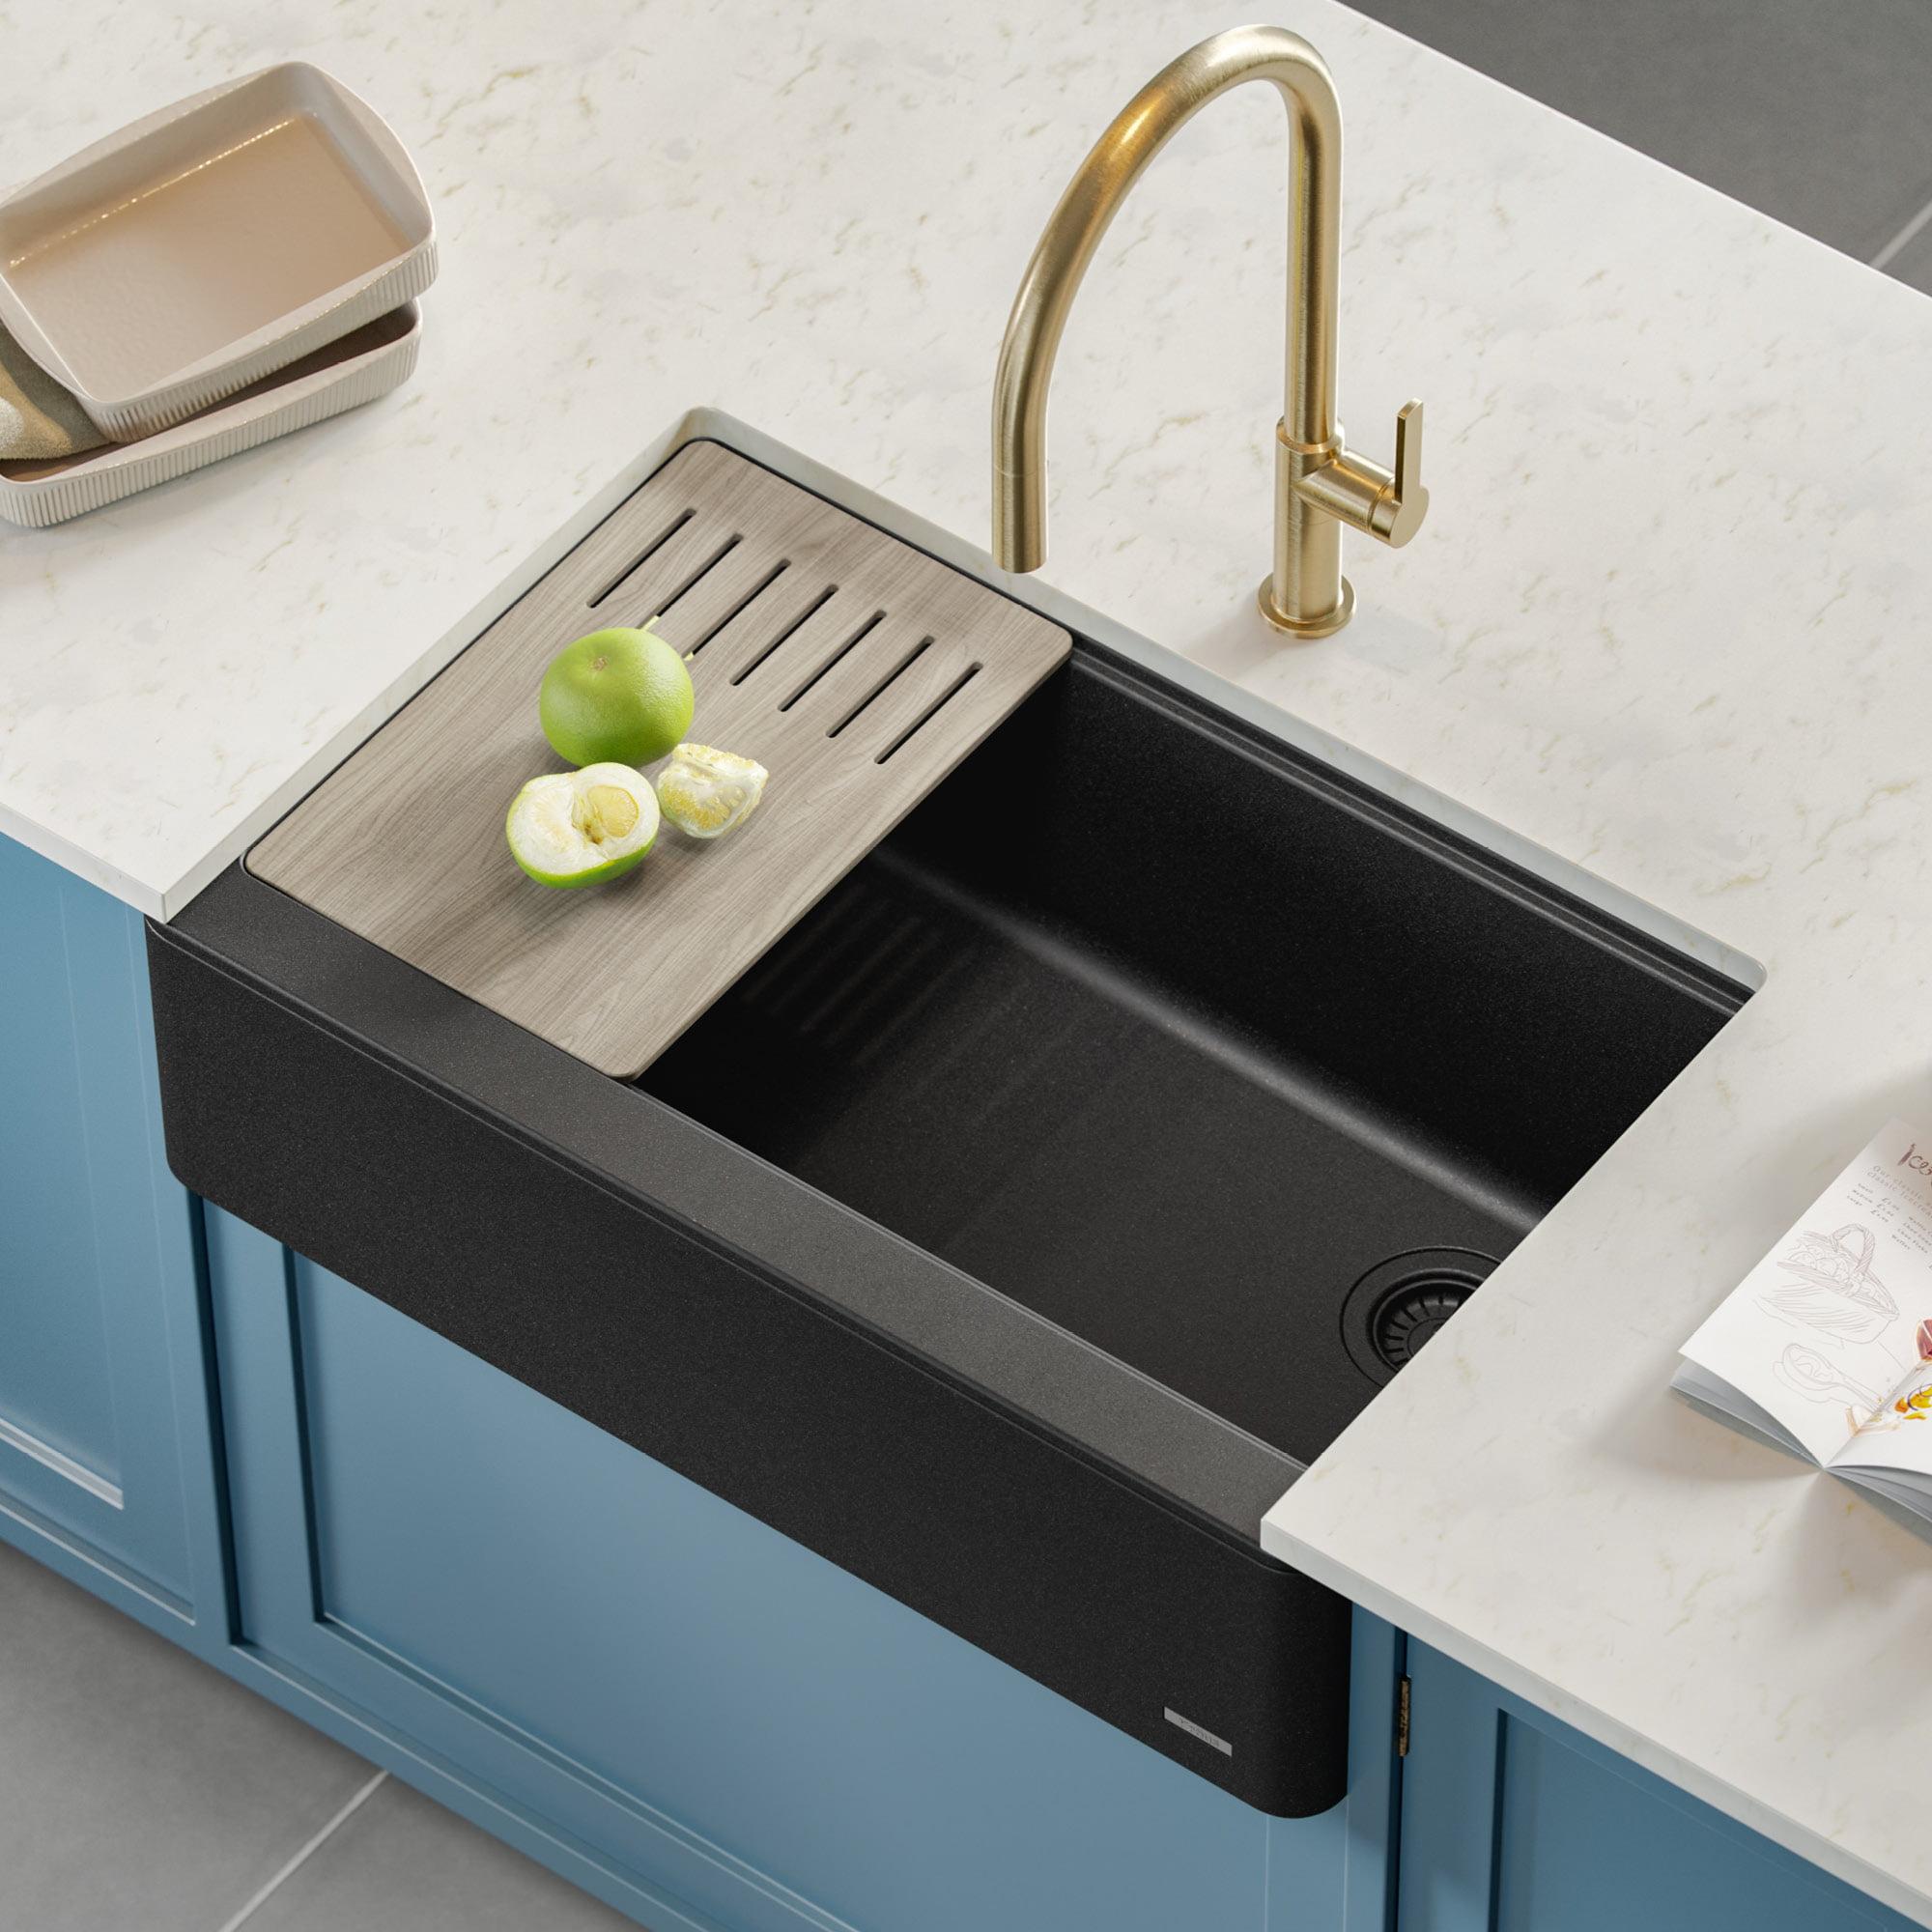 Kraus Bellucci Workstation 33 Quartz Composite Single Bowl Farmhouse Kitchen Sink In Metallic Black Walmart Com Walmart Com